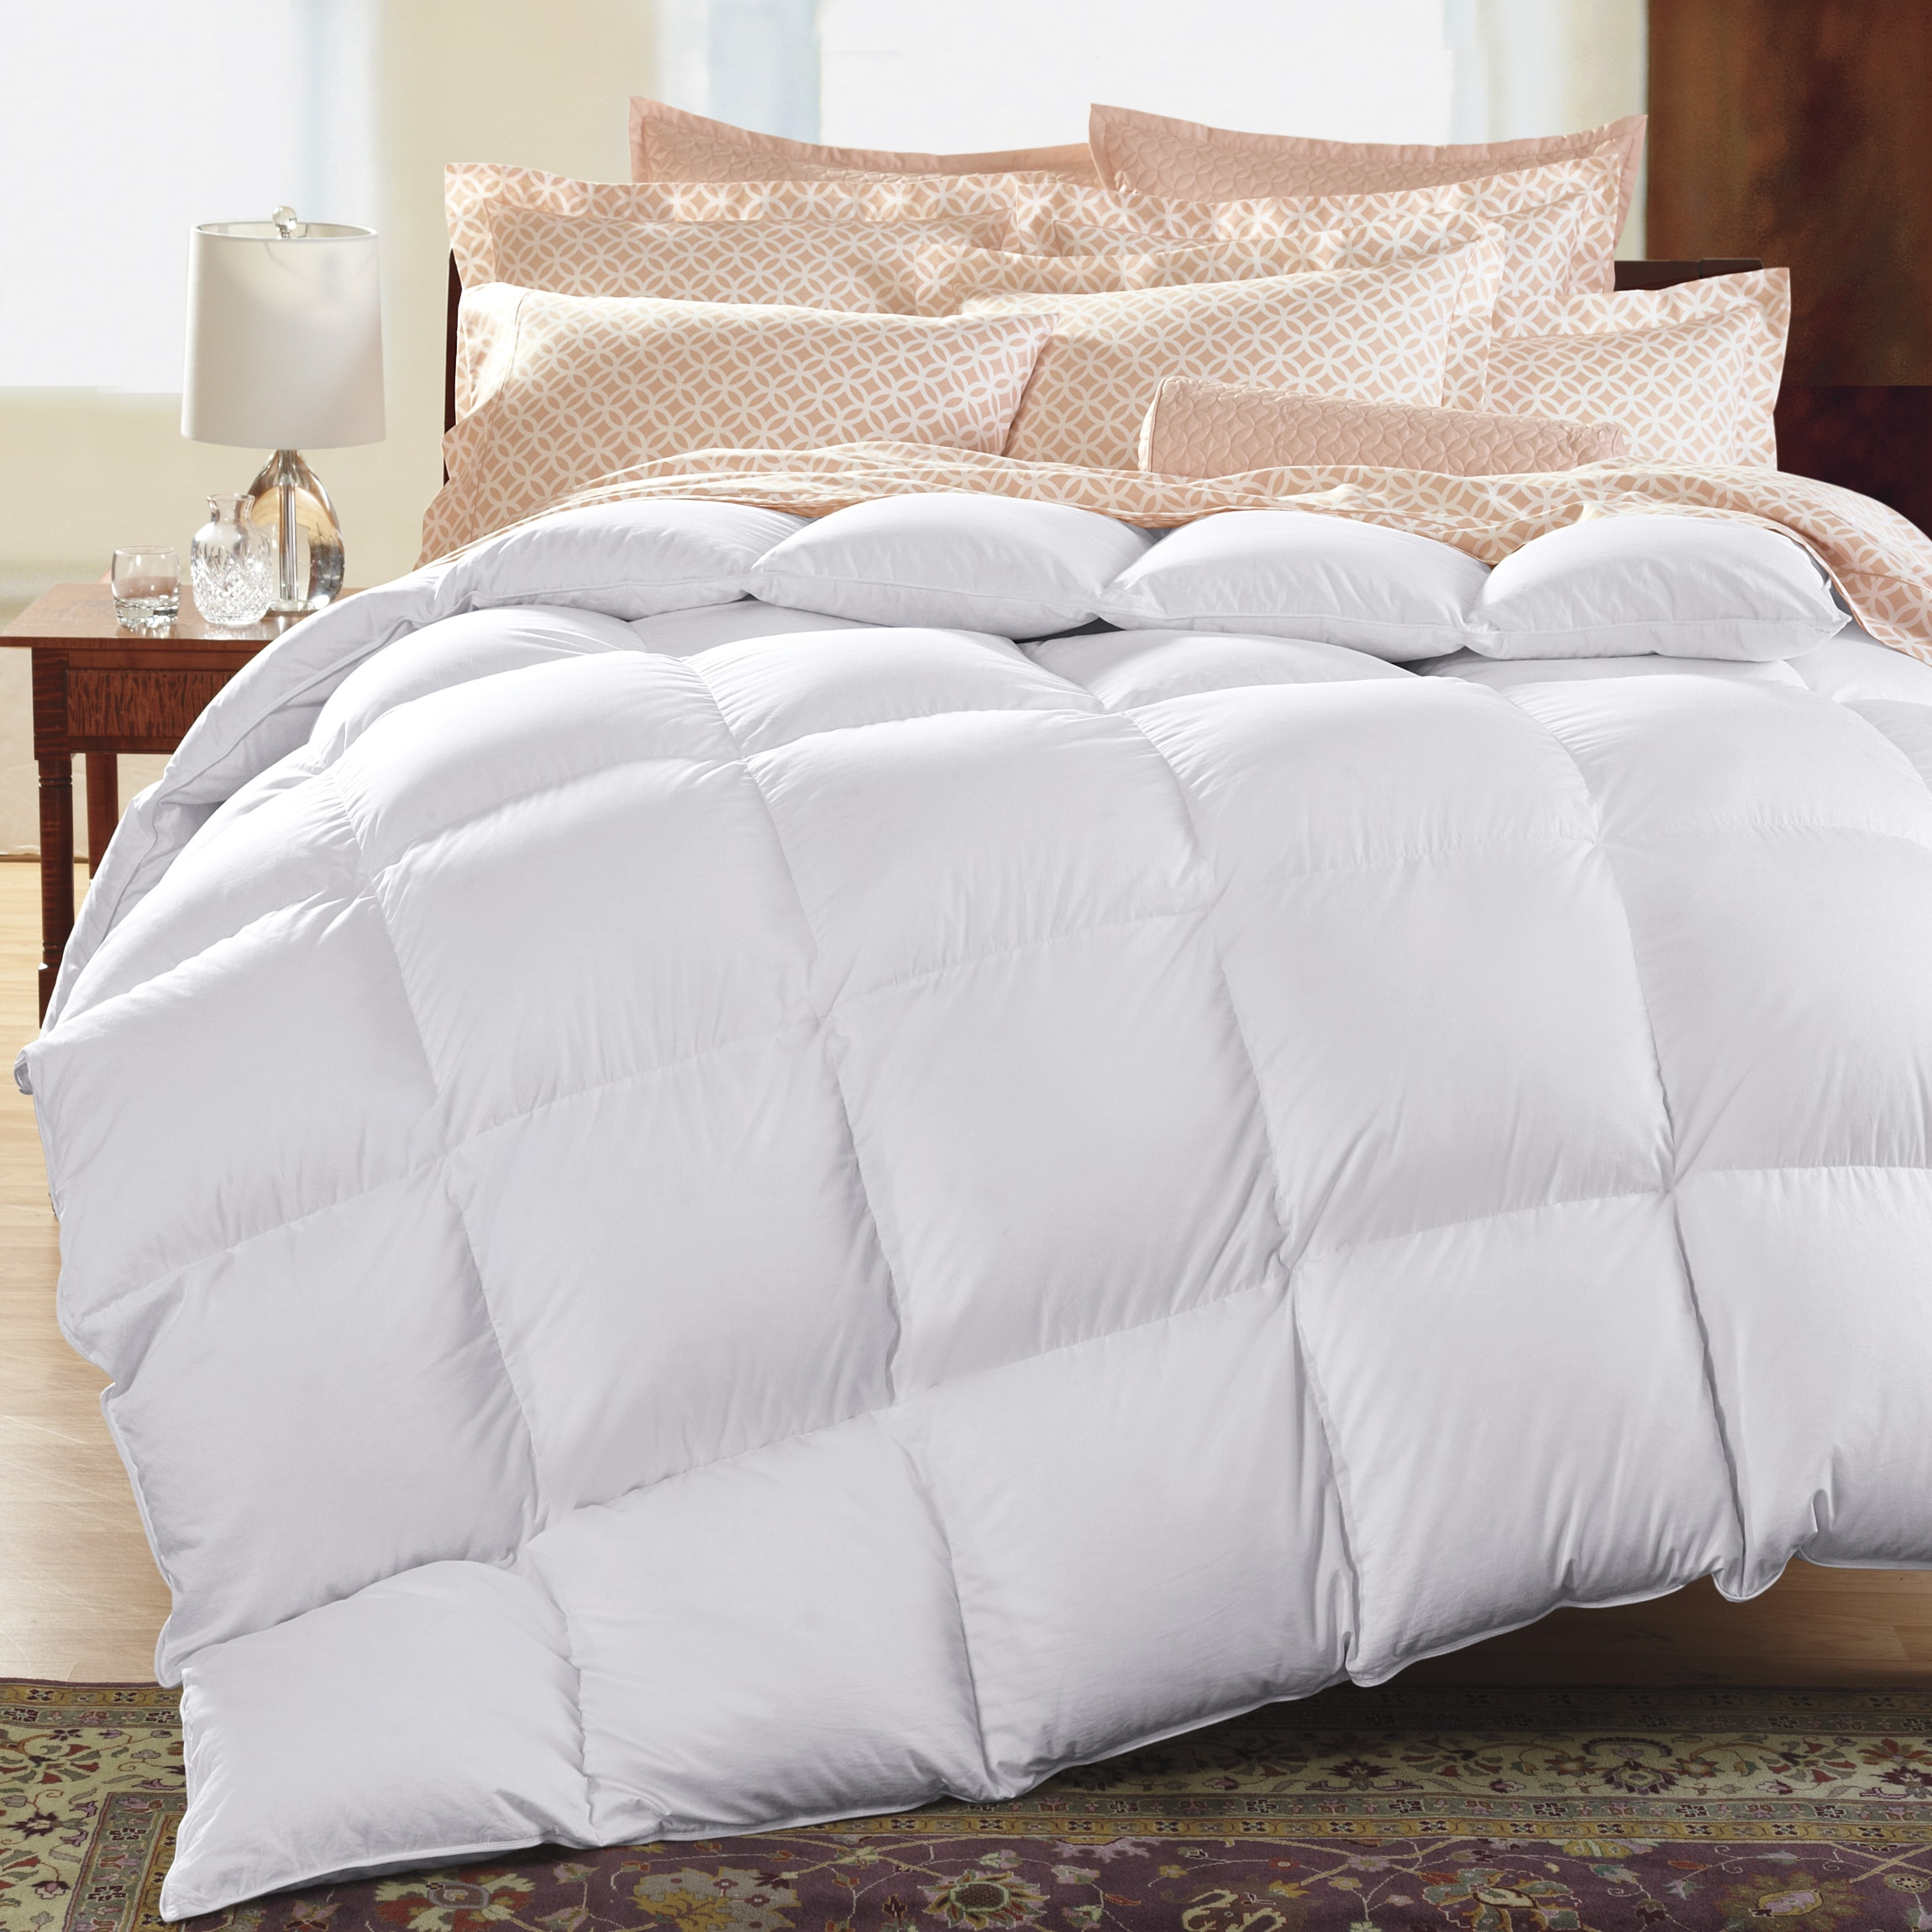 Famous Maker Light Weight White Down Comforter Overstock 8600931